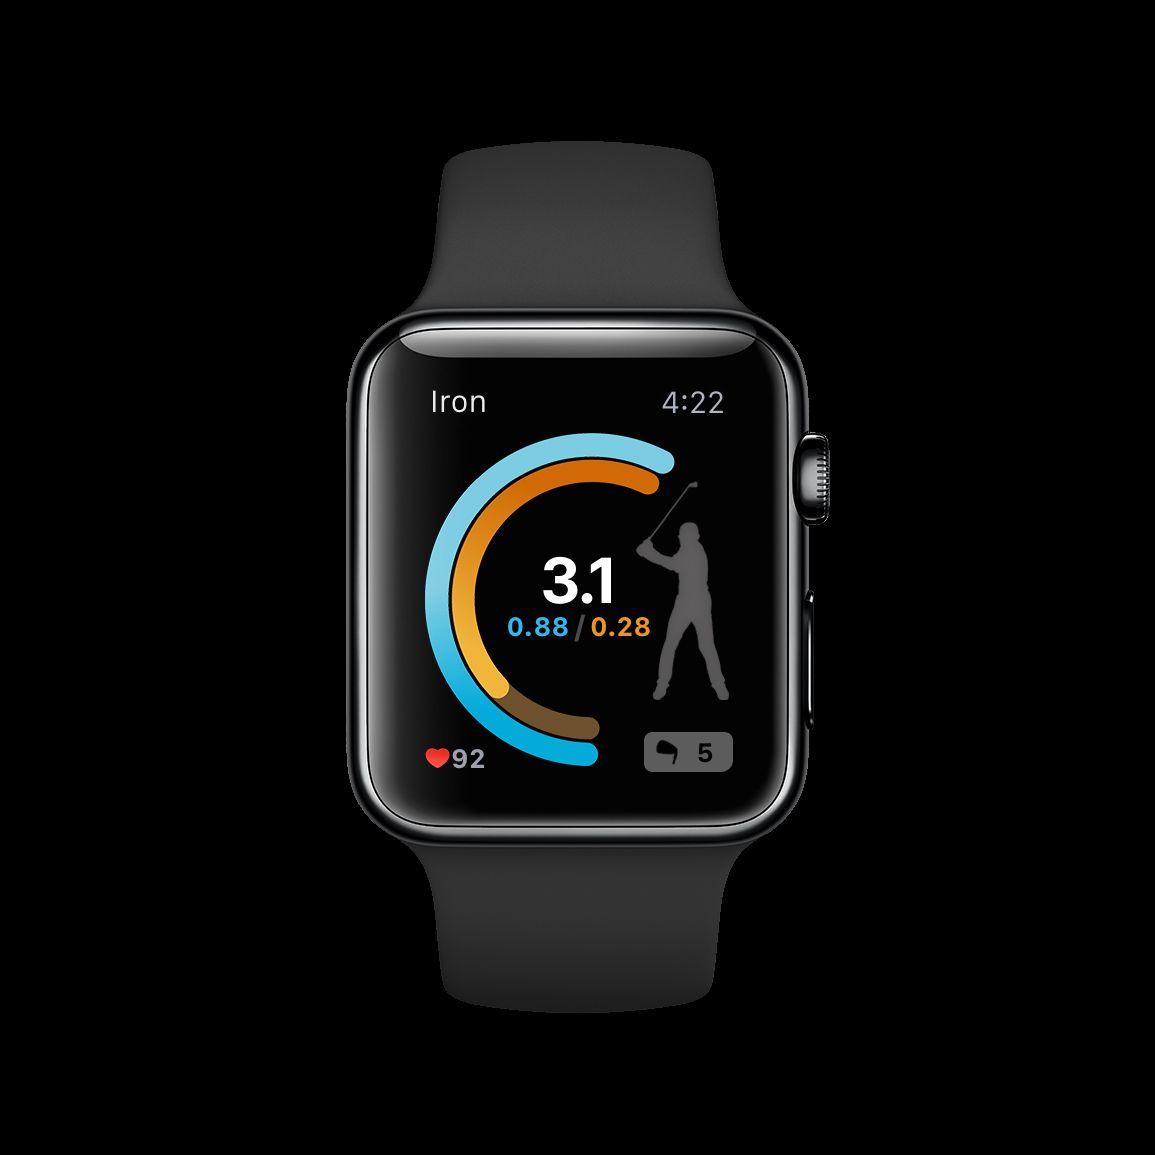 Pings golf workout golfizing apple watchs fitness